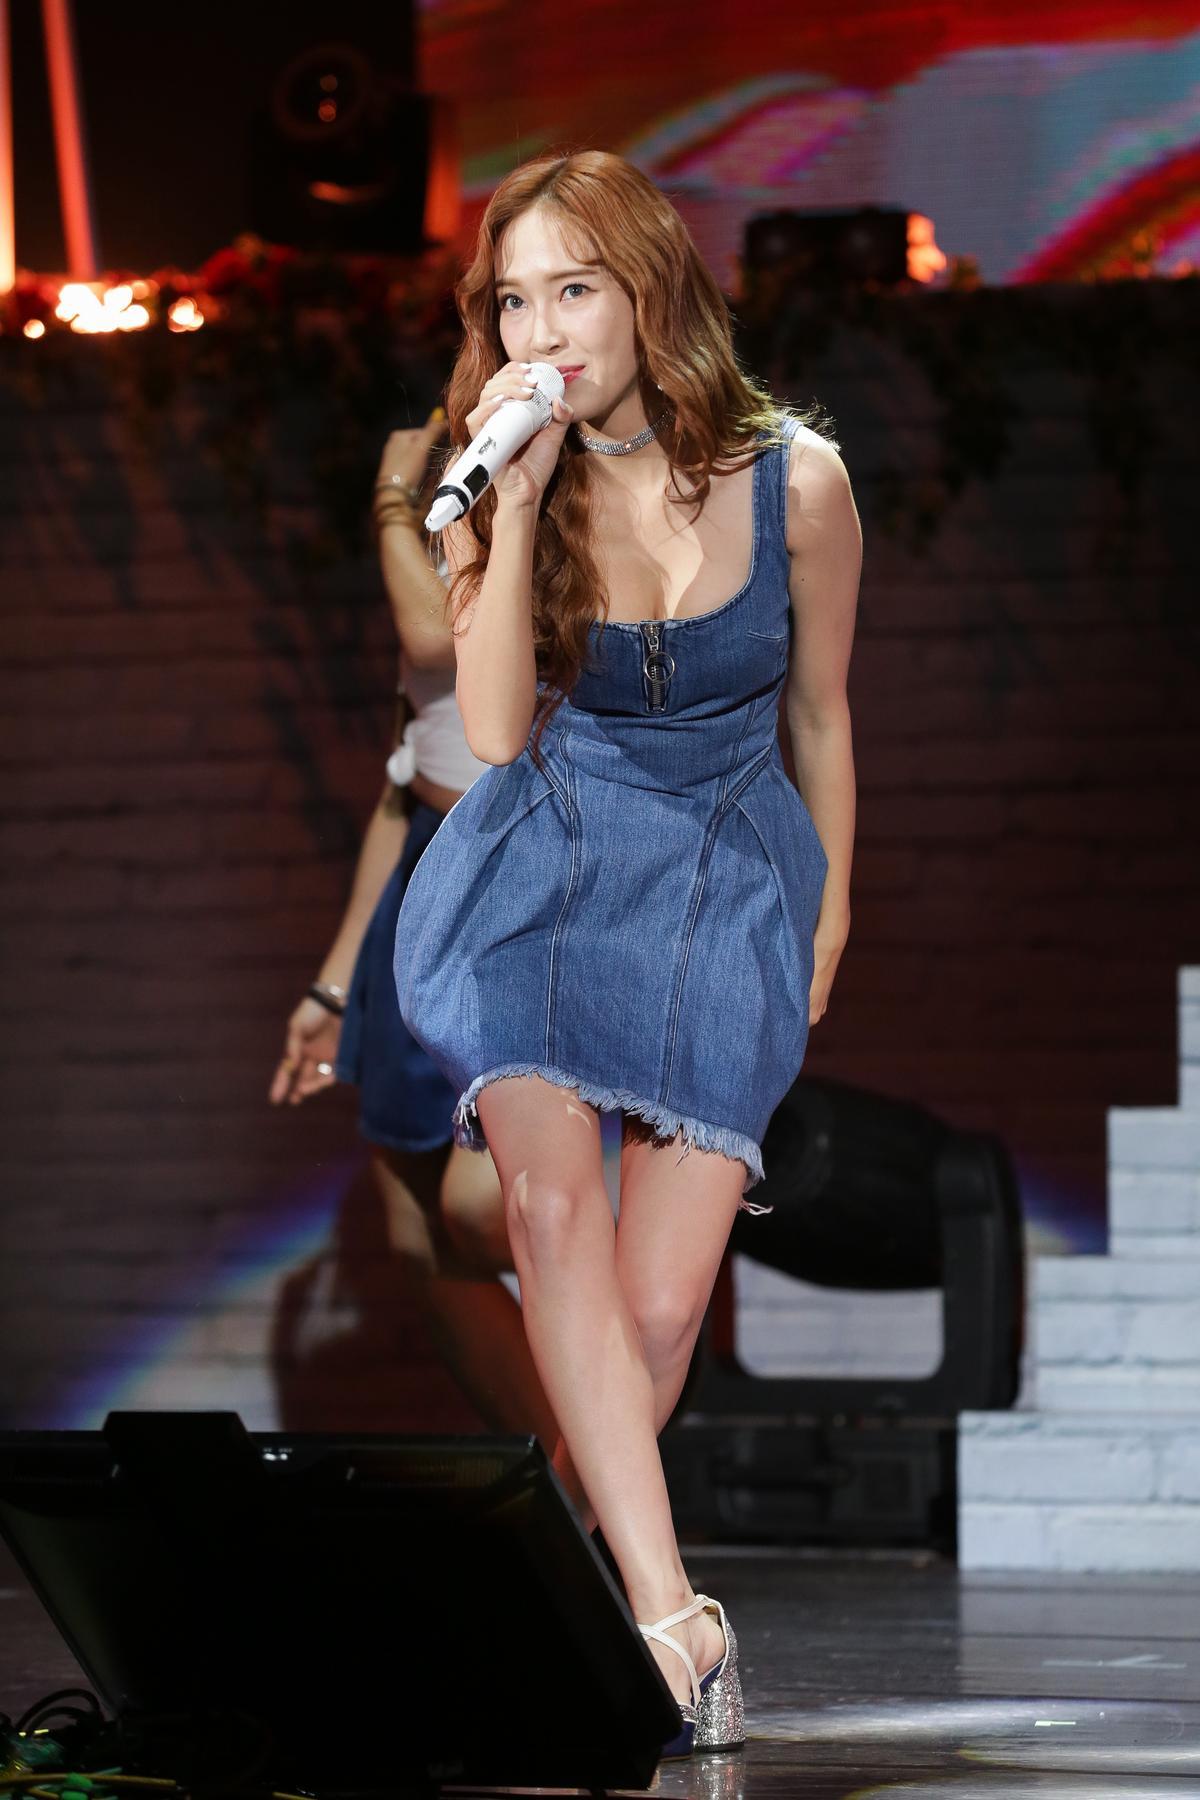 Jessica唱、跳時,時不時地用手壓裙子。